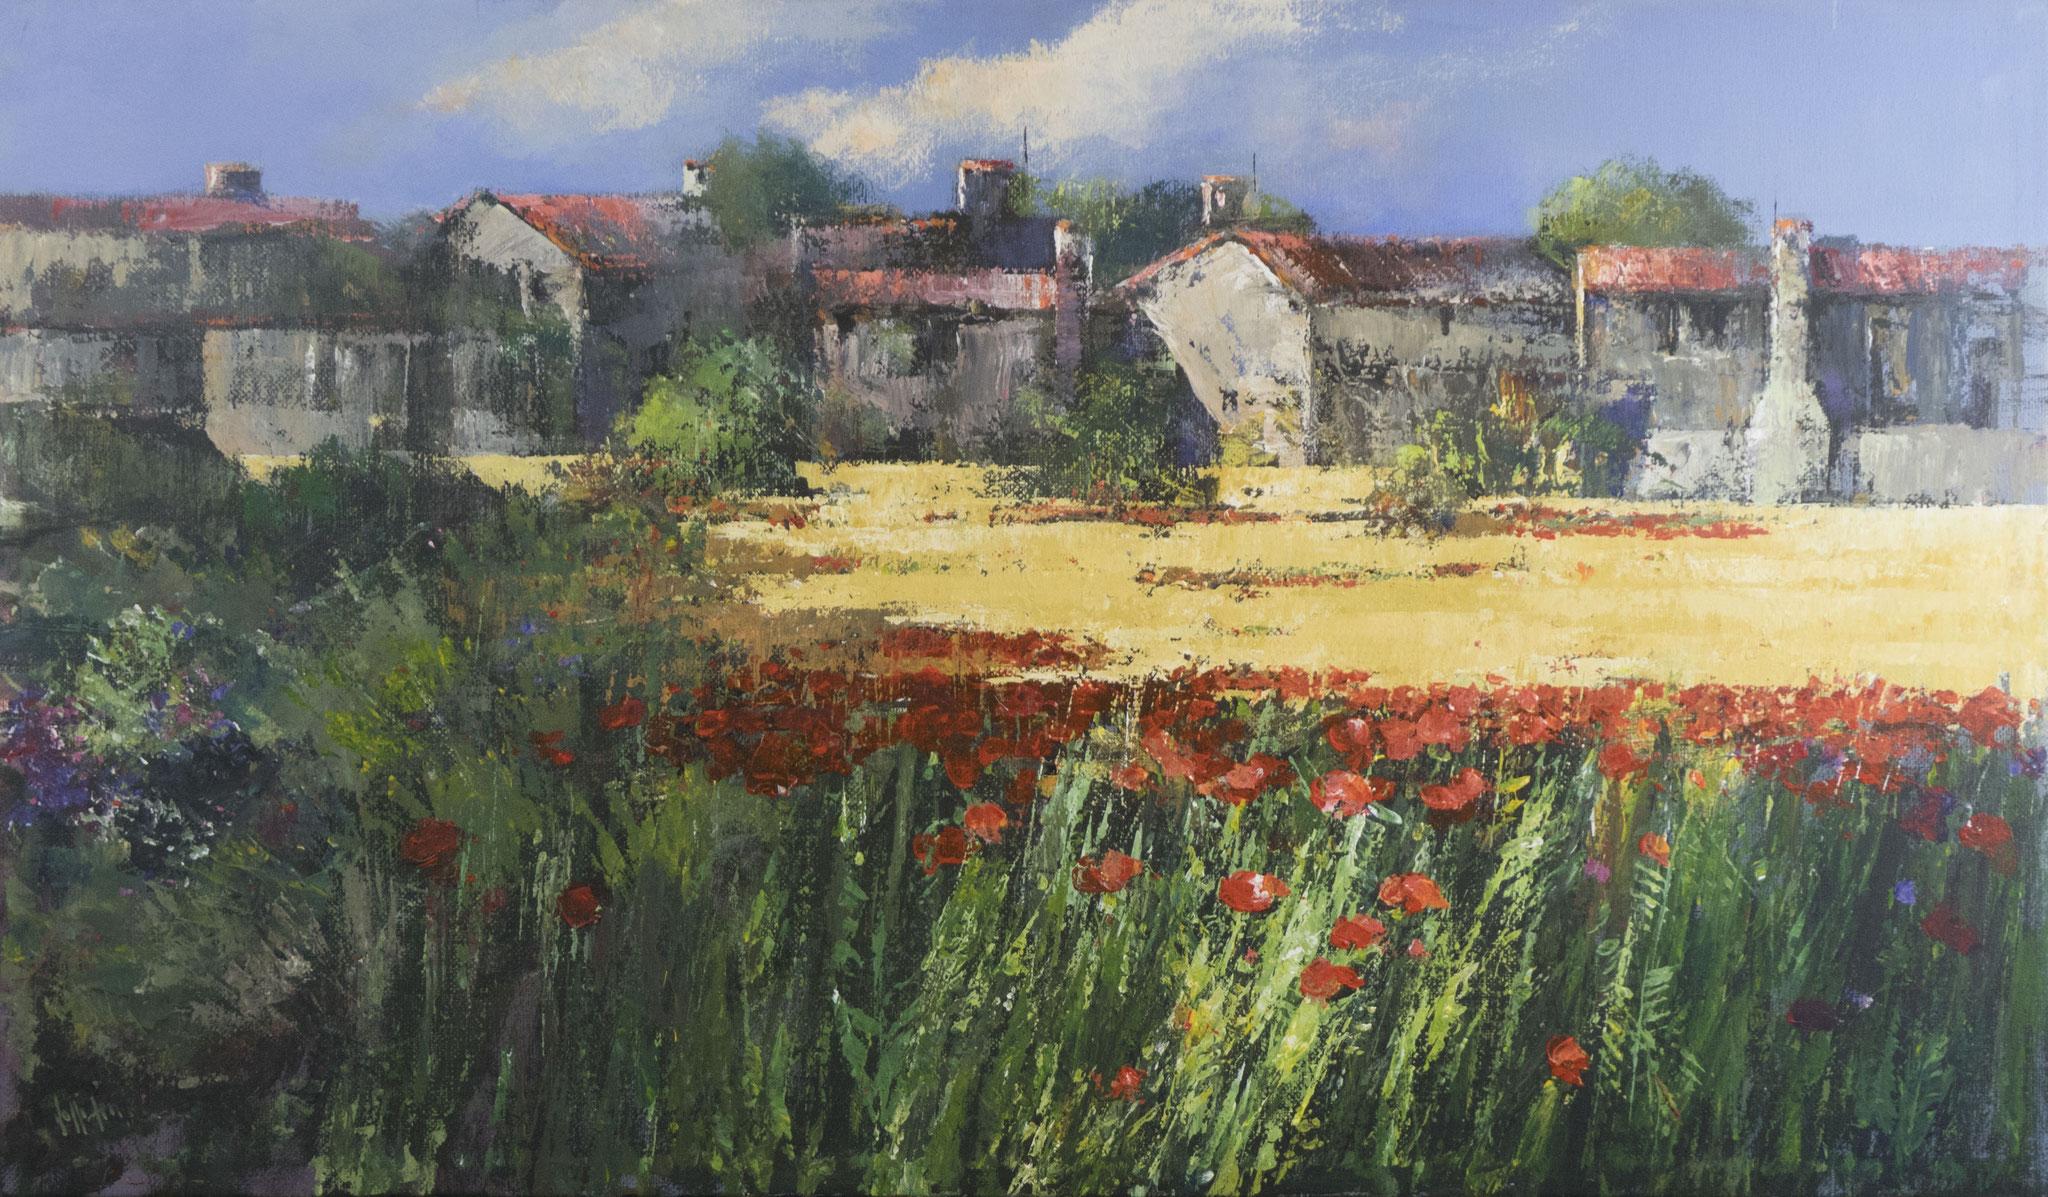 """La calda estate"" - Öl auf Leinwand - 120x70 cm"